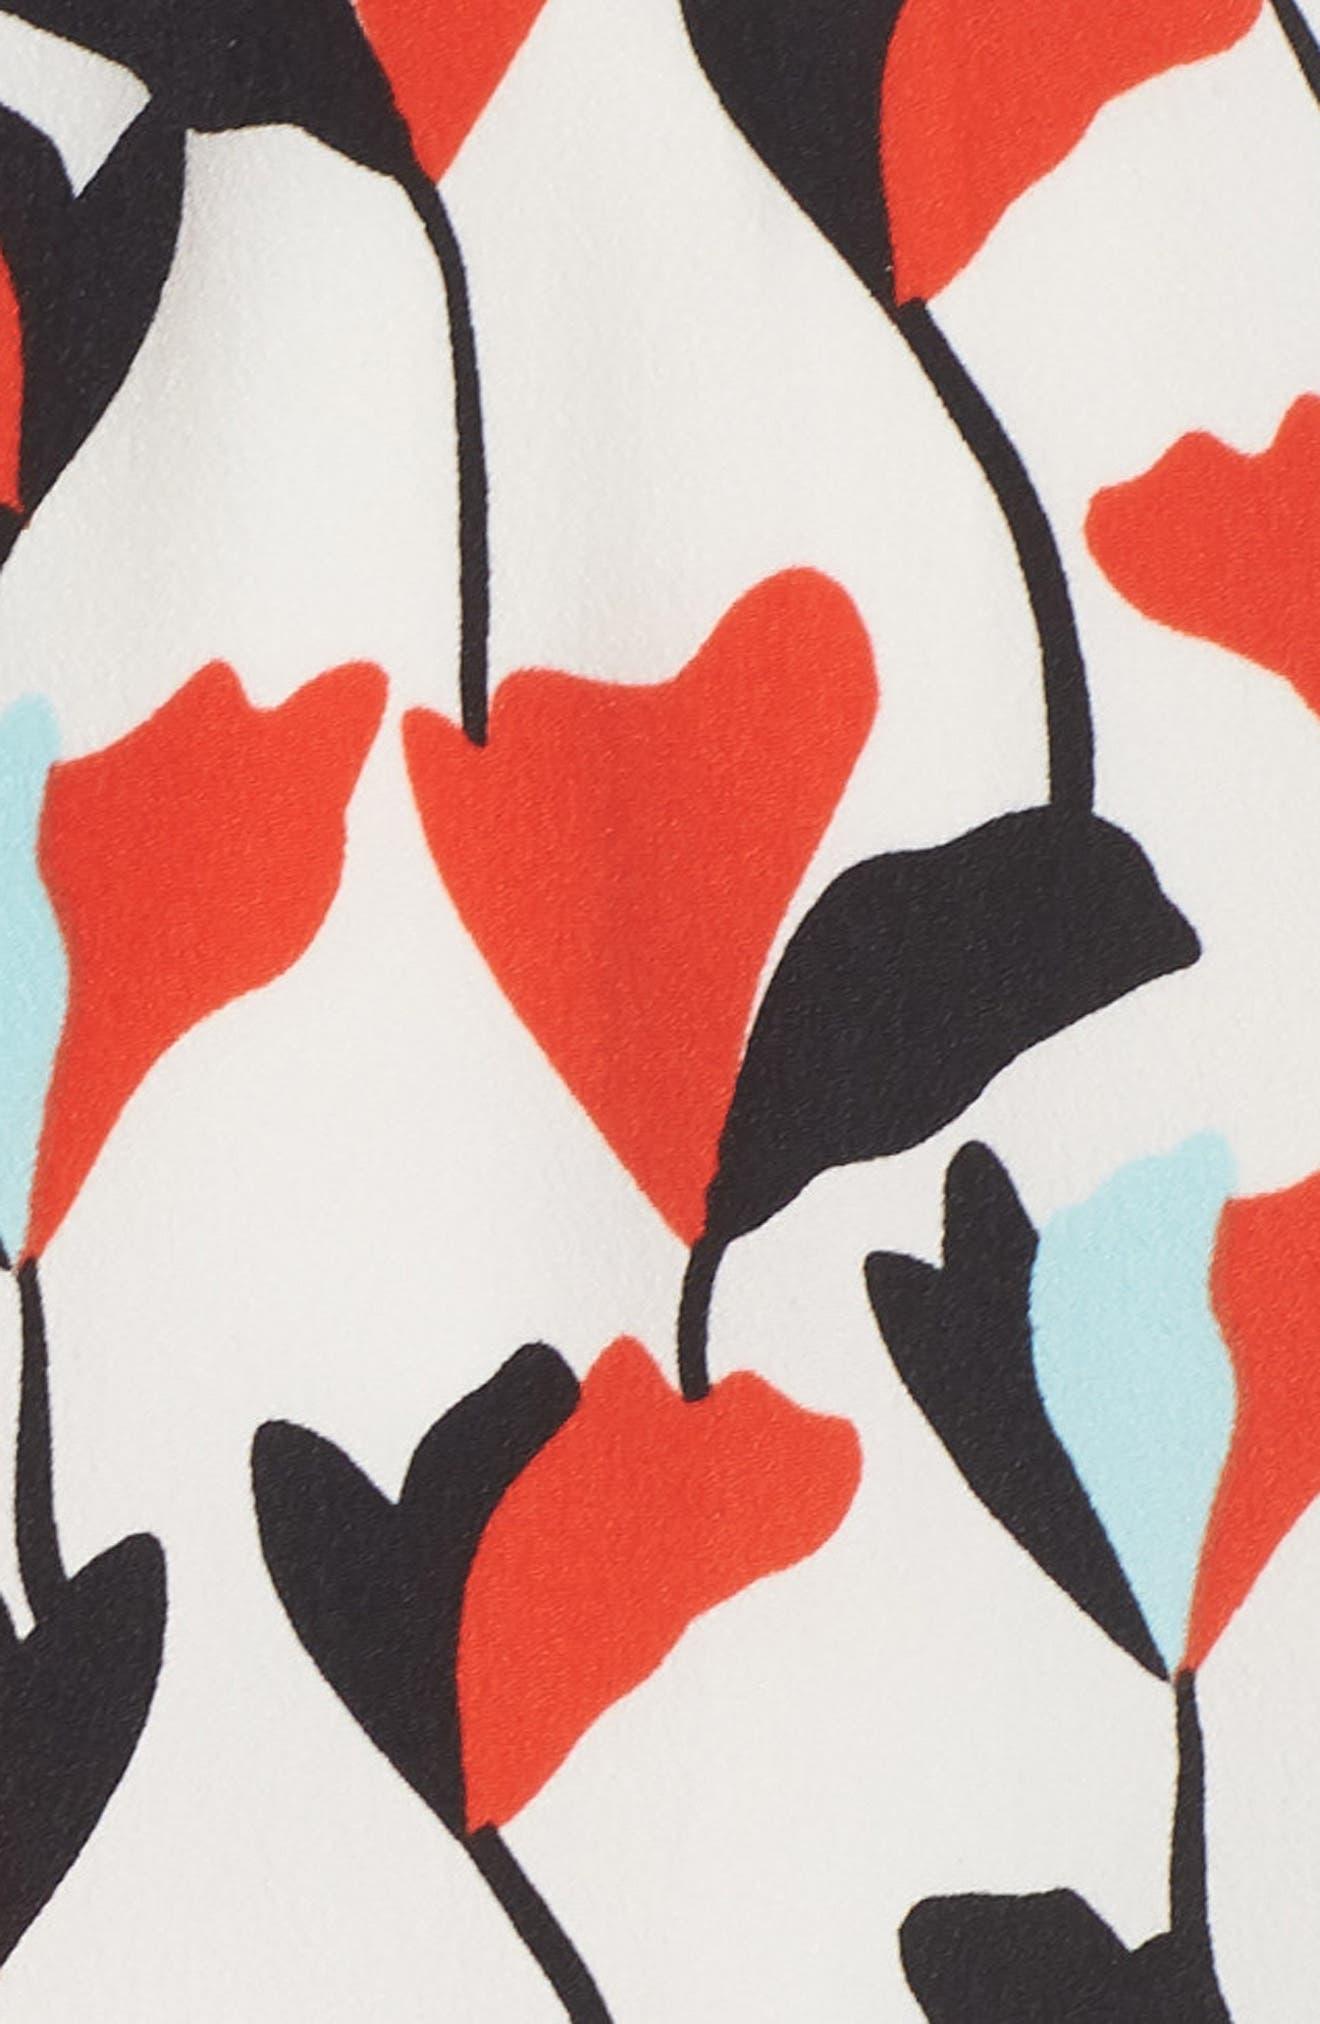 Floral Off the Shoulder Tie Waist Dress,                             Alternate thumbnail 6, color,                             Soft White/ Powder Blue